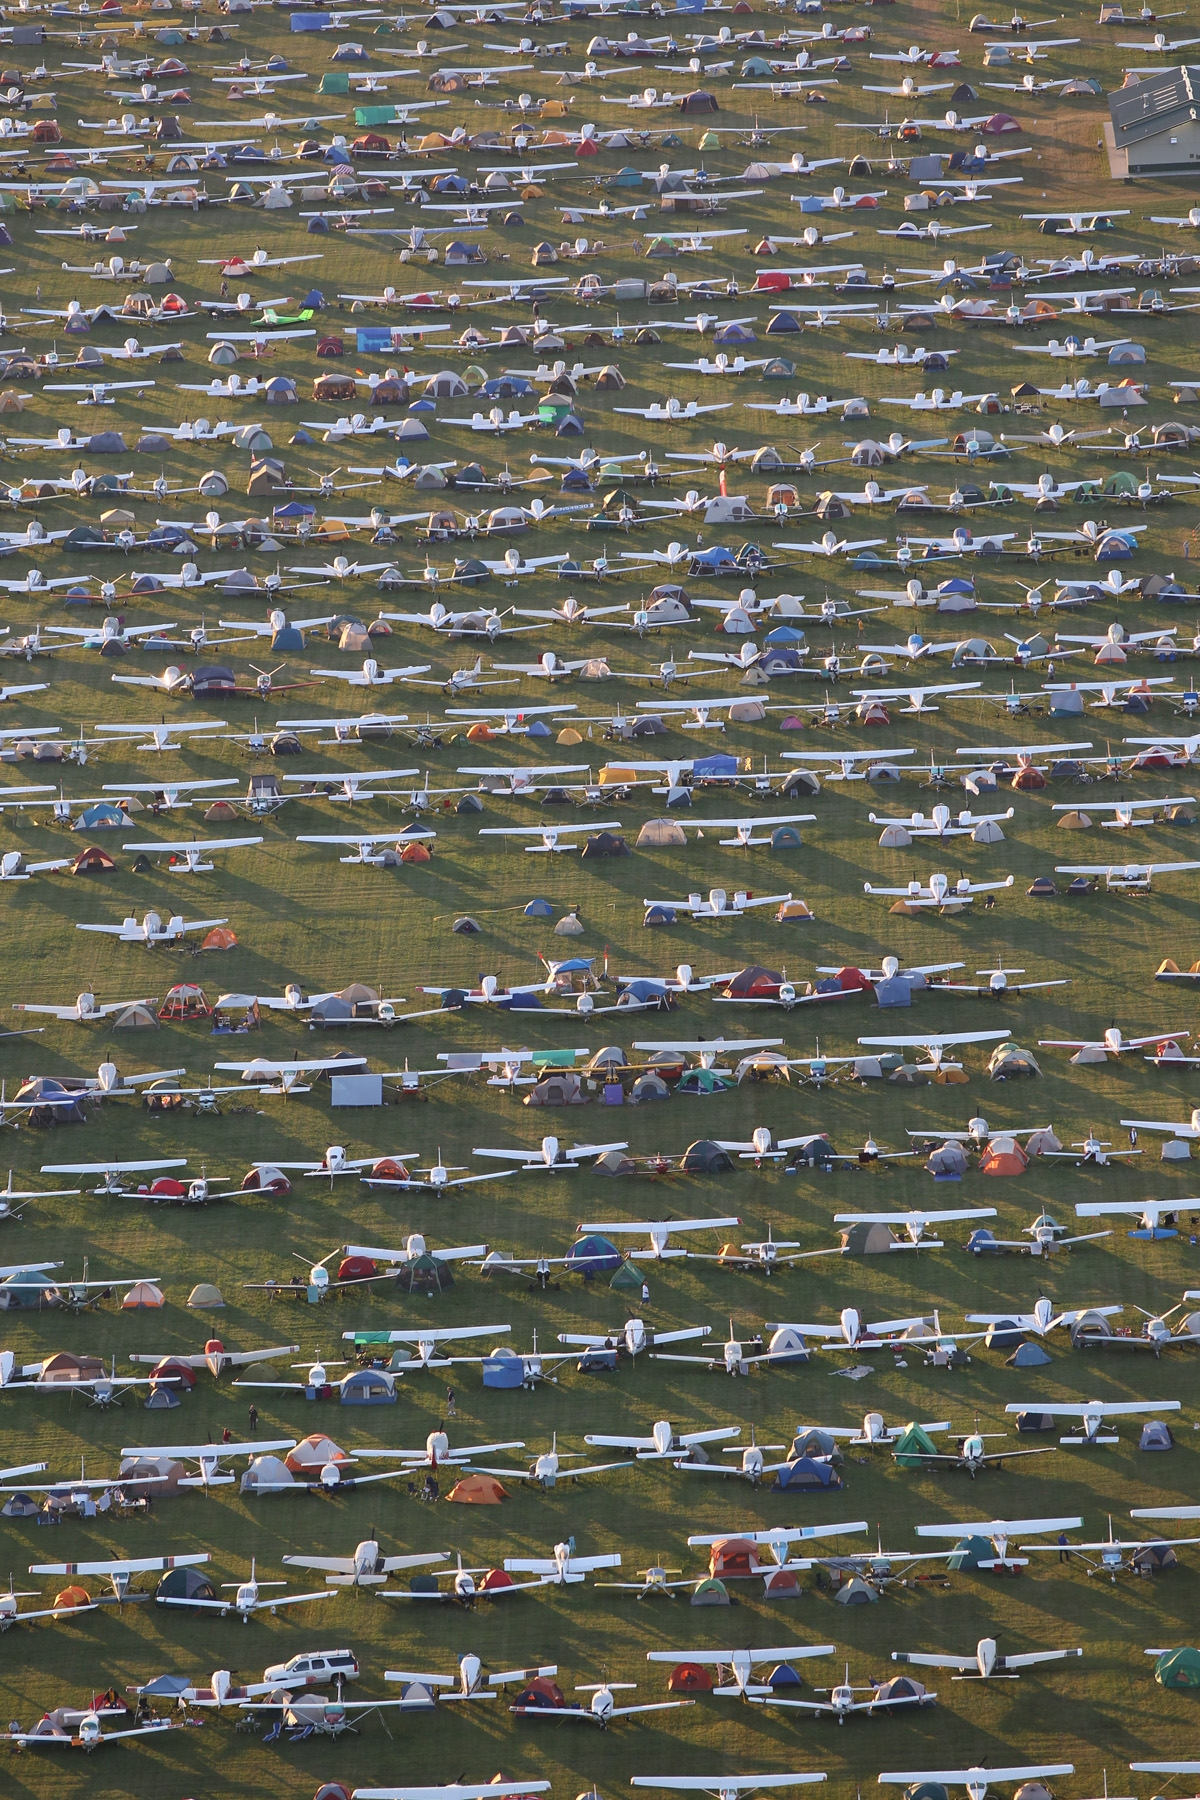 eaa airventure oshkosh 2015 schedule set for high